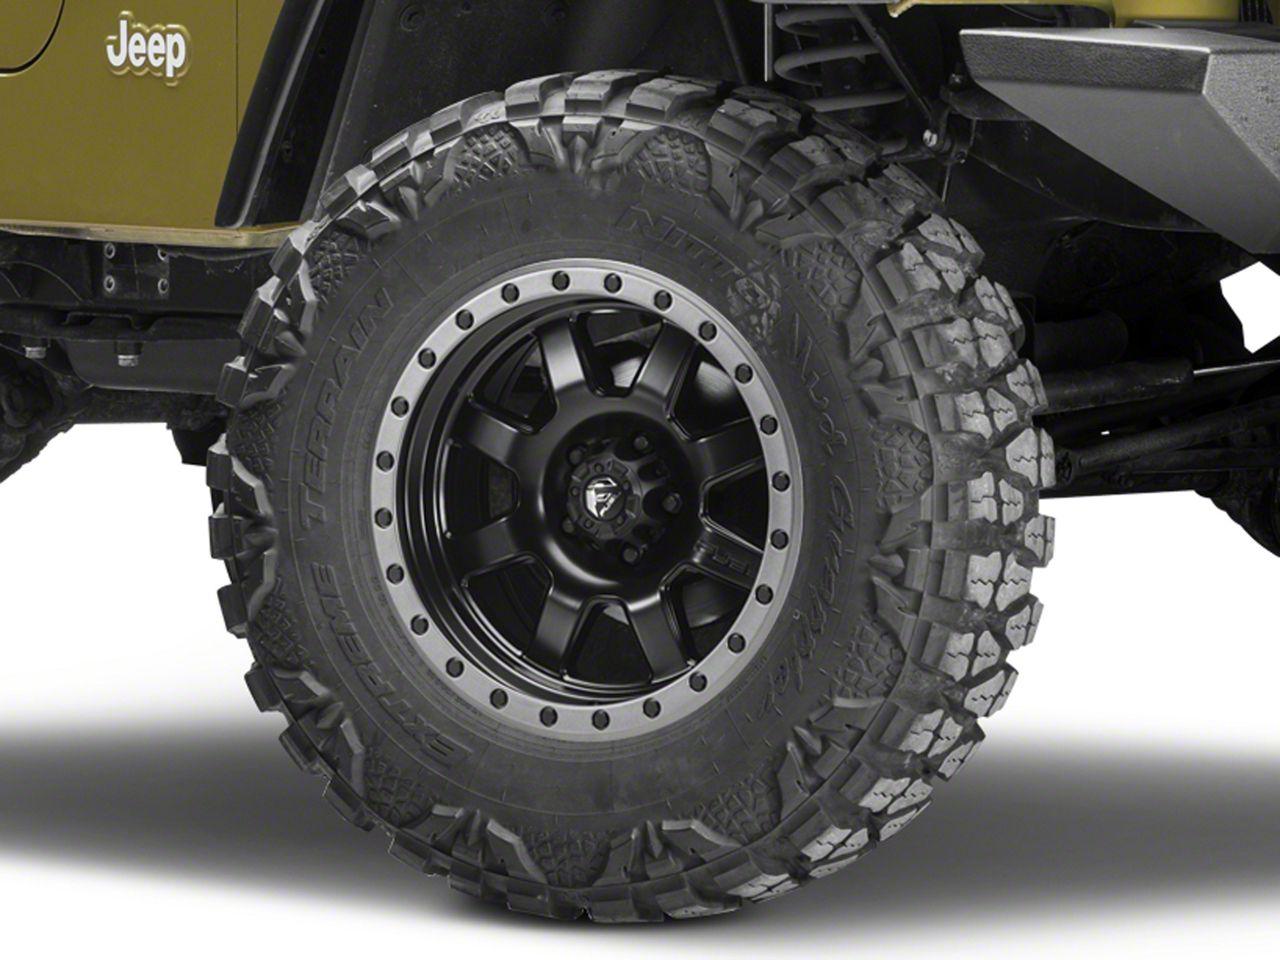 Fuel Wheels Trophy Matte Black w/ Anthracite Ring Wheel - 17x8.5 (87-06 Jeep Wrangler YJ & TJ)